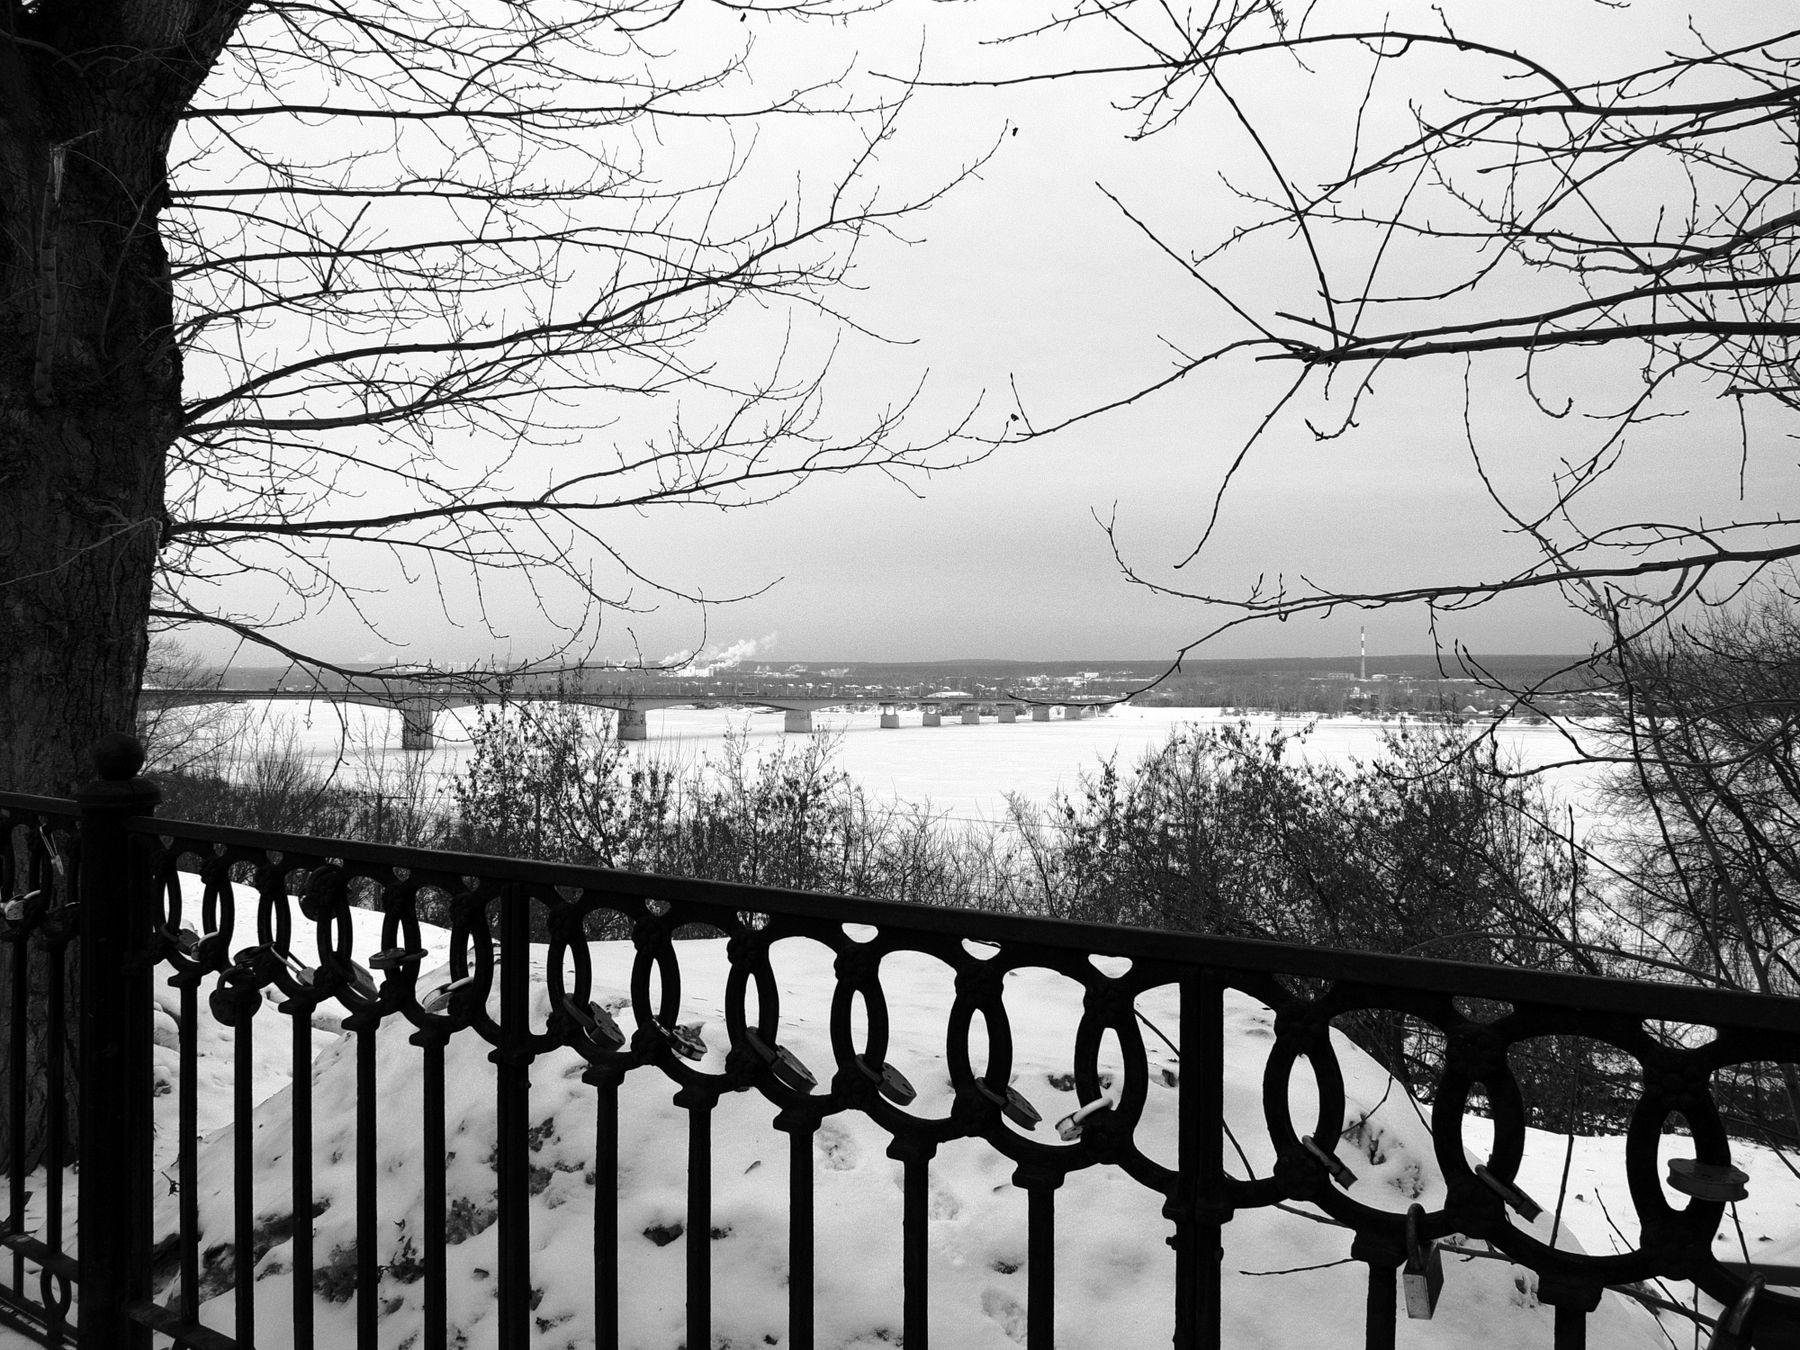 Вид на Каму город Пермь зима Кама Камский мост чугунная ограда ветки снег Шварц